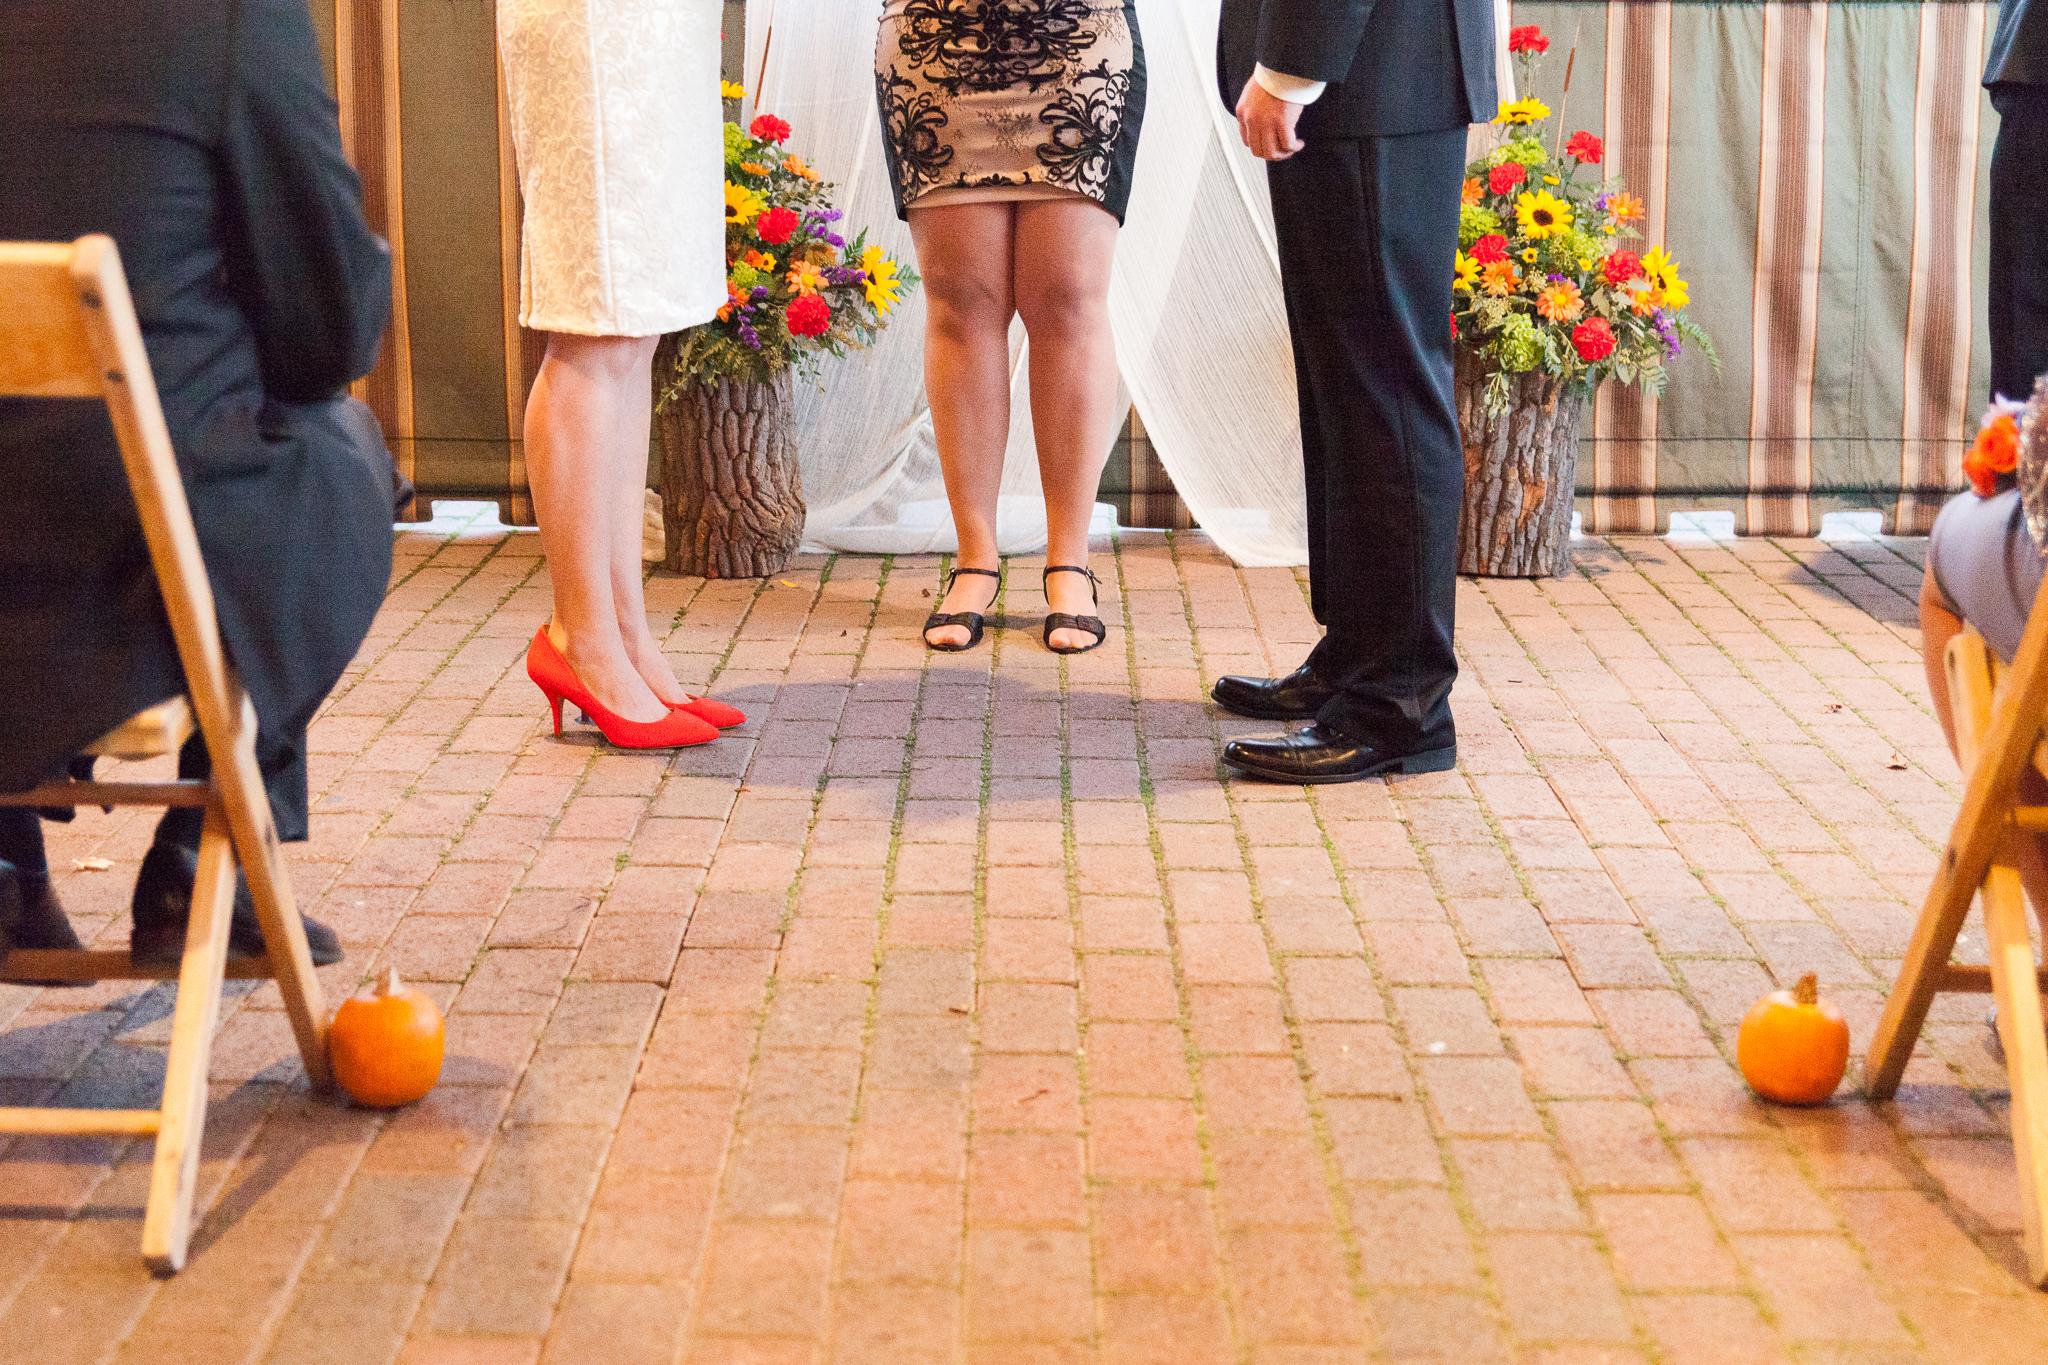 camuglia-whomstudio-chelsea_and_andy-nycphotographer-wedding-brooklyn-buffalo-timberlodge-075-0577.jpg